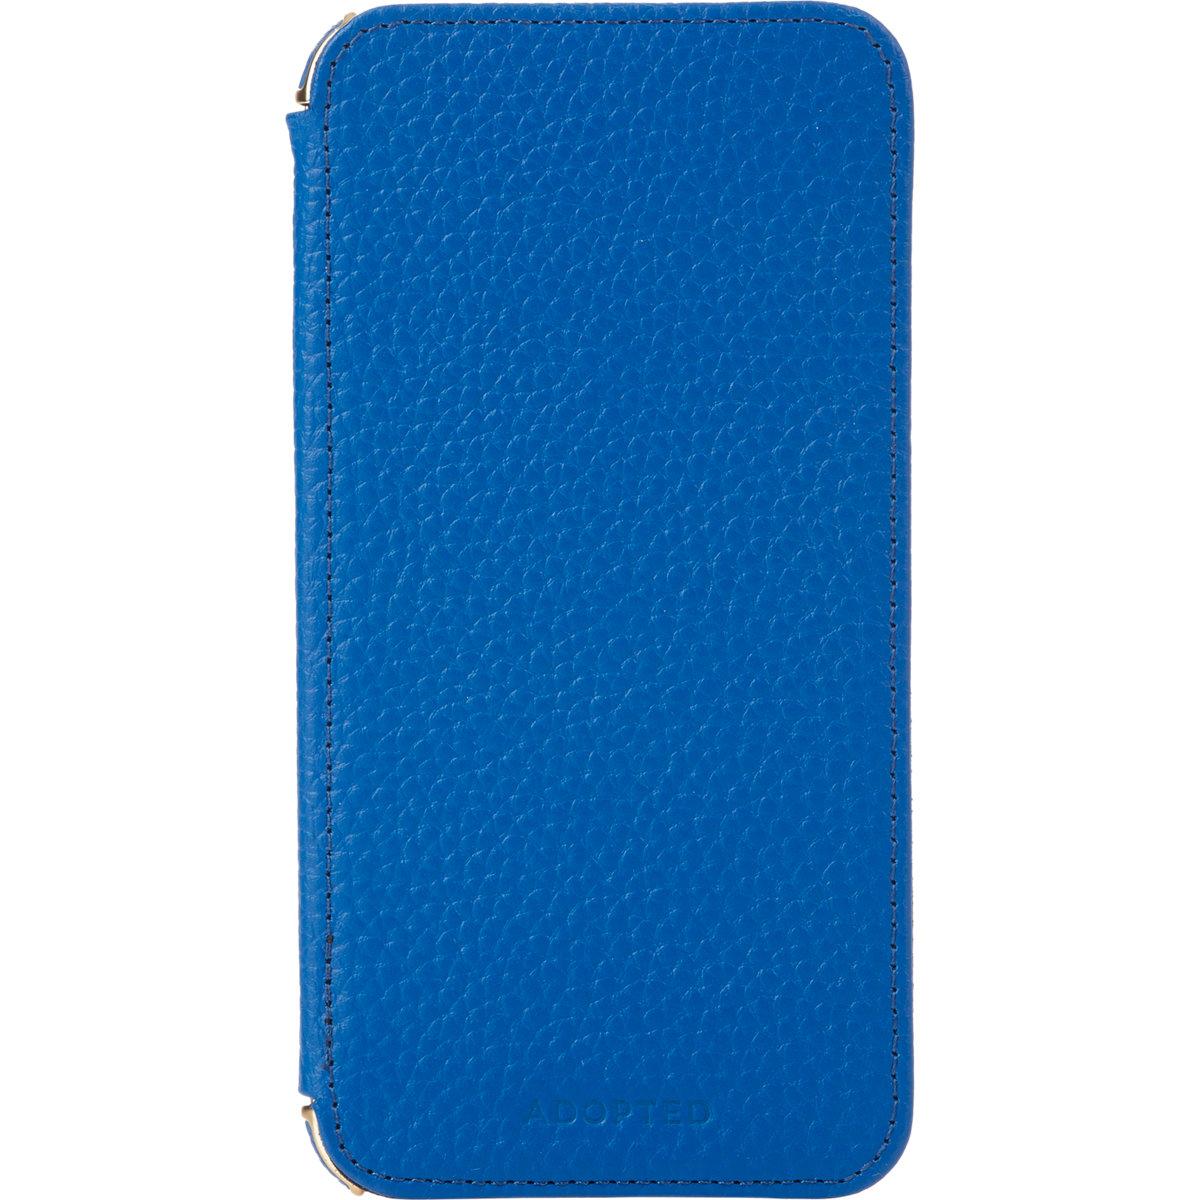 Case Design gigi new york phone case Adopted Leather Iphoneu00ae 6 Plus Folio Case in Blue : Lyst